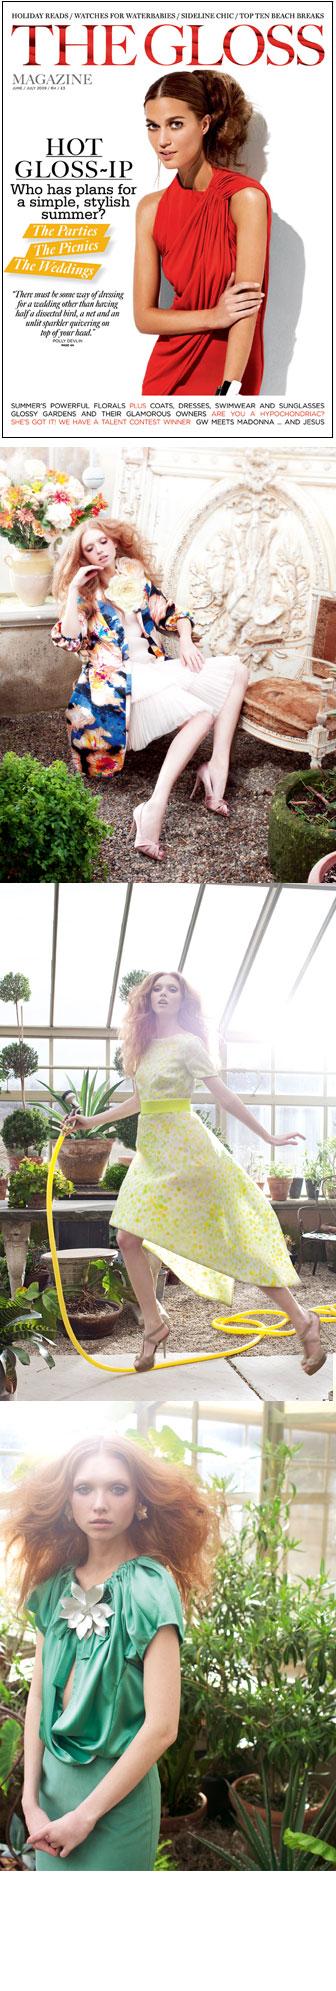 The Gloss Irish Fashion Magazine